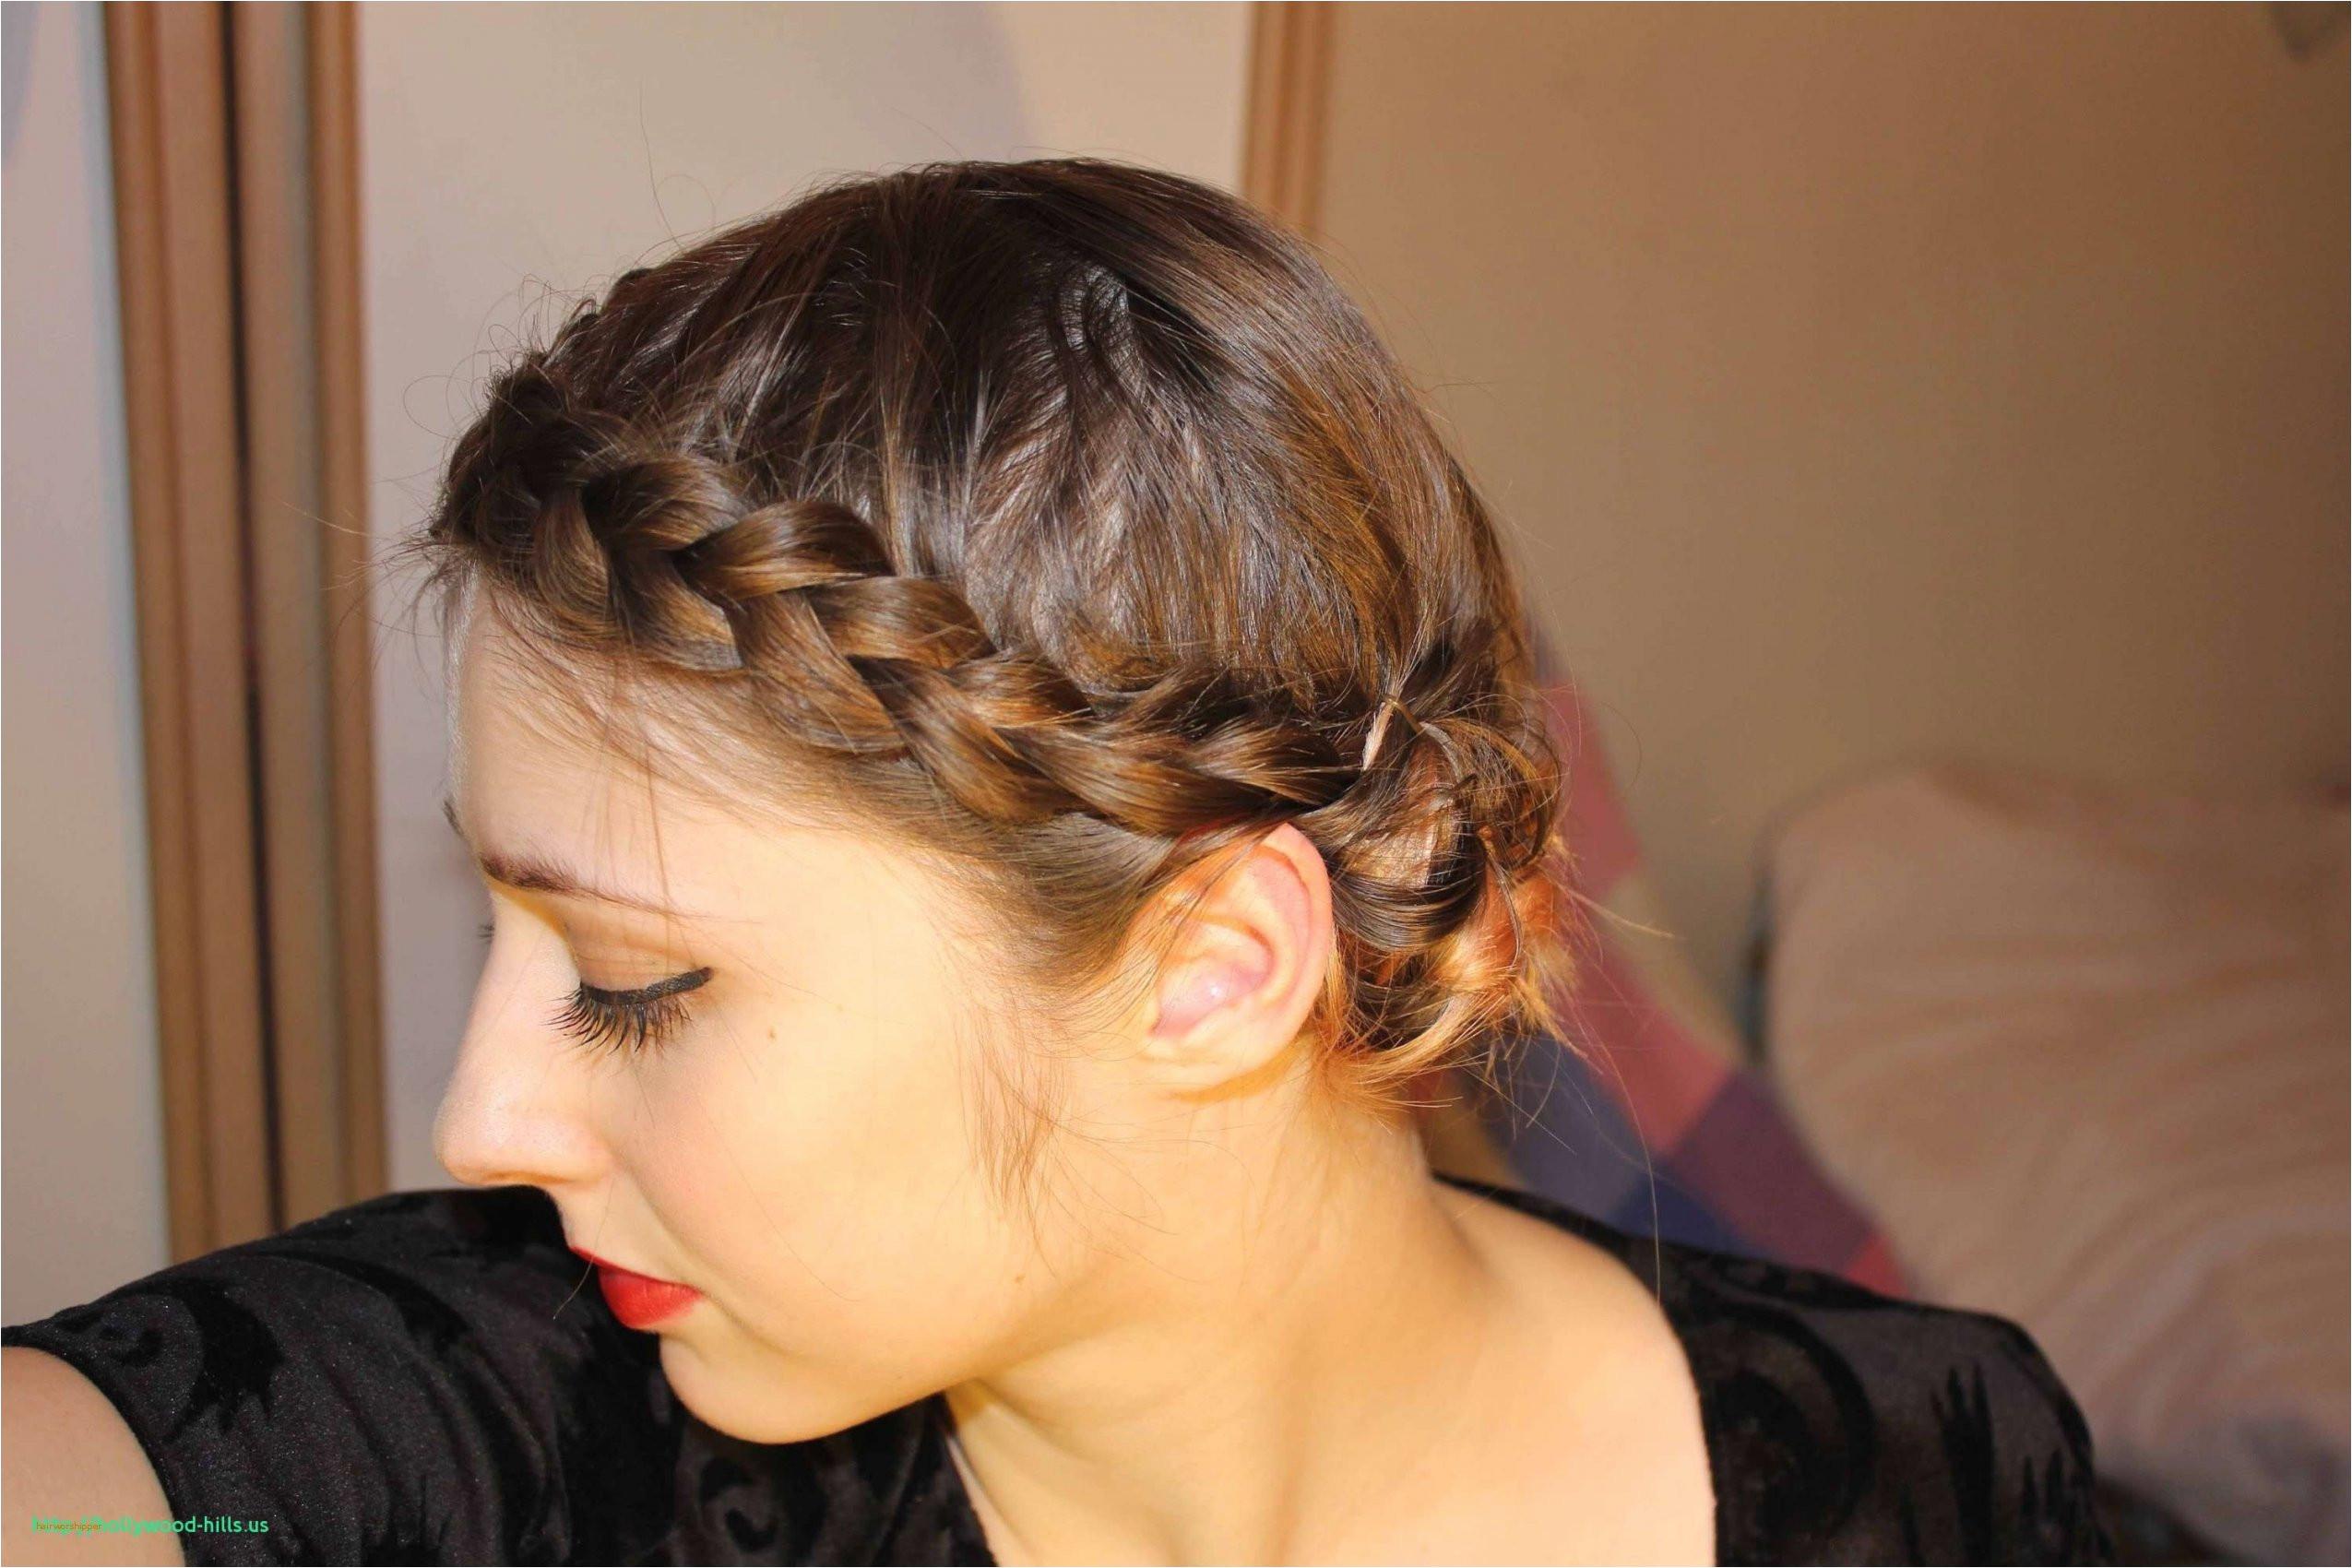 Beautiful Simple Hairstyles for School Dailymotion Unique Girl Hairstyles for School Elegant Lovely Beautiful Girl